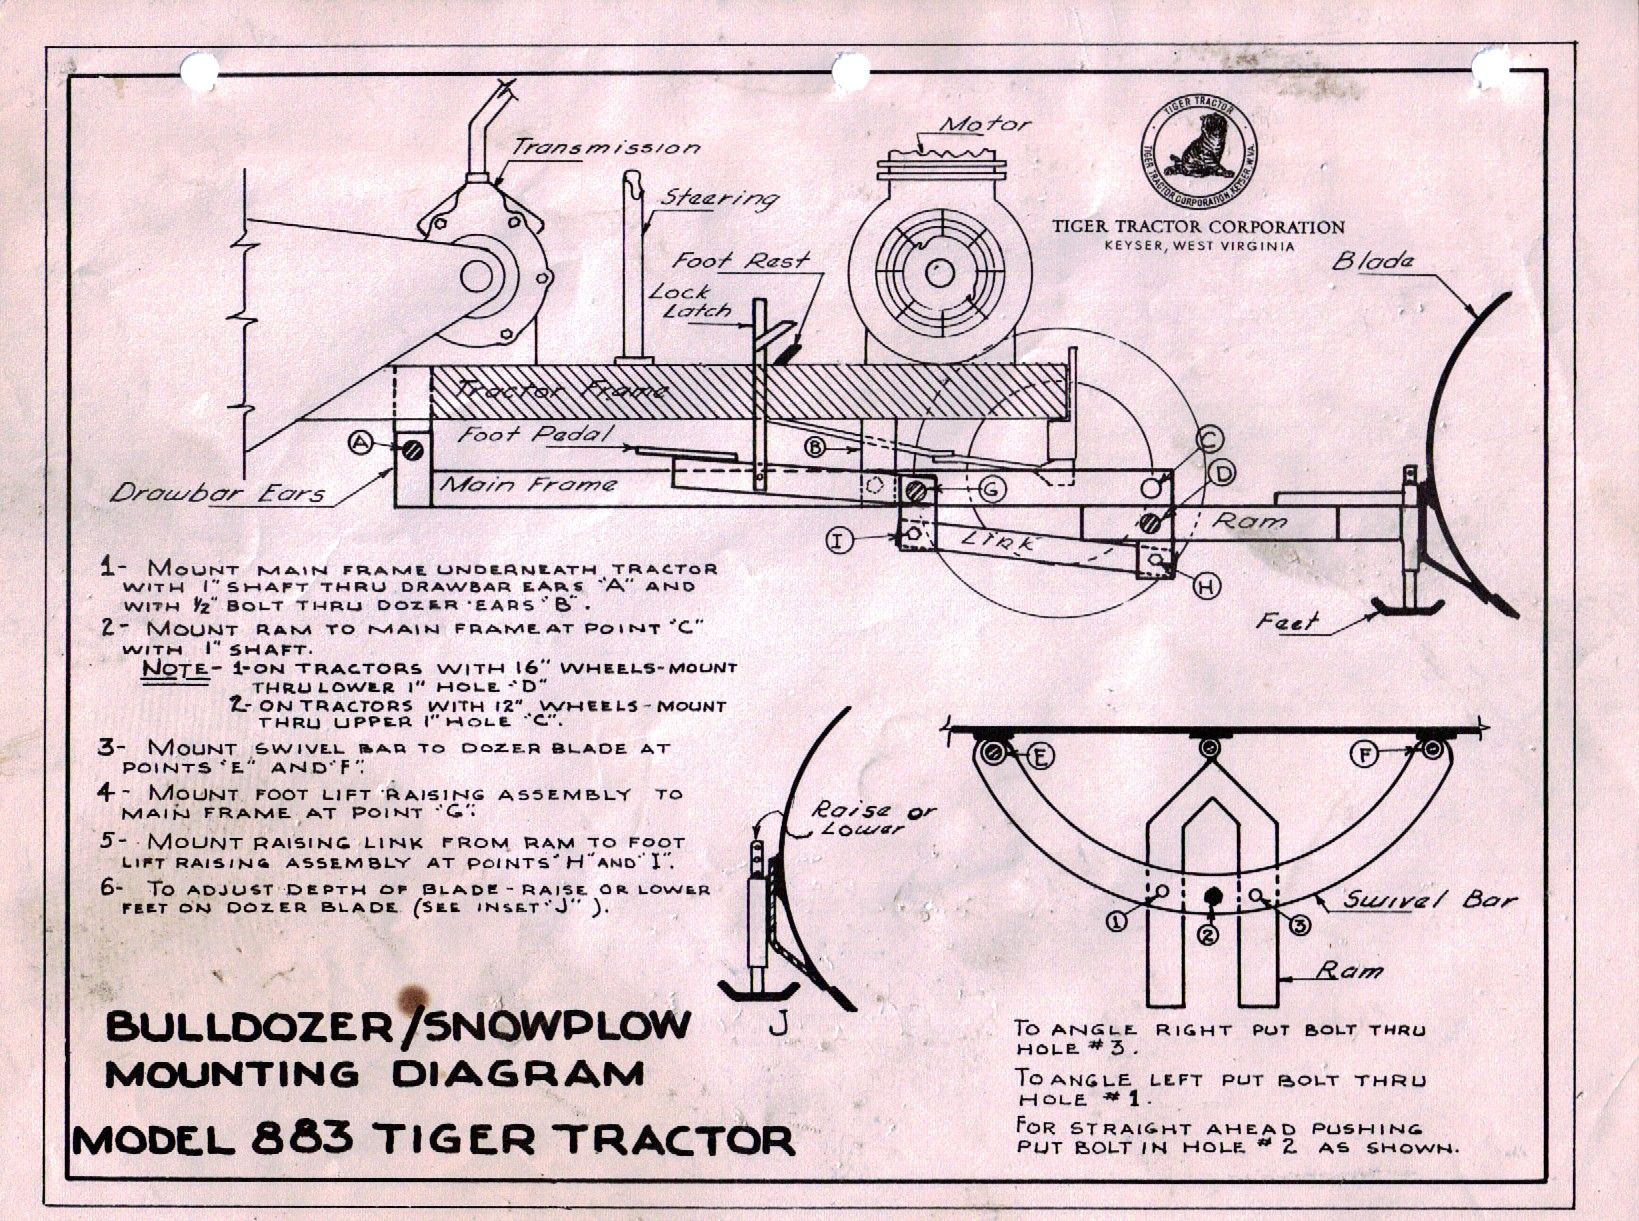 hight resolution of tiger bulldozer snowplow mounting diagram